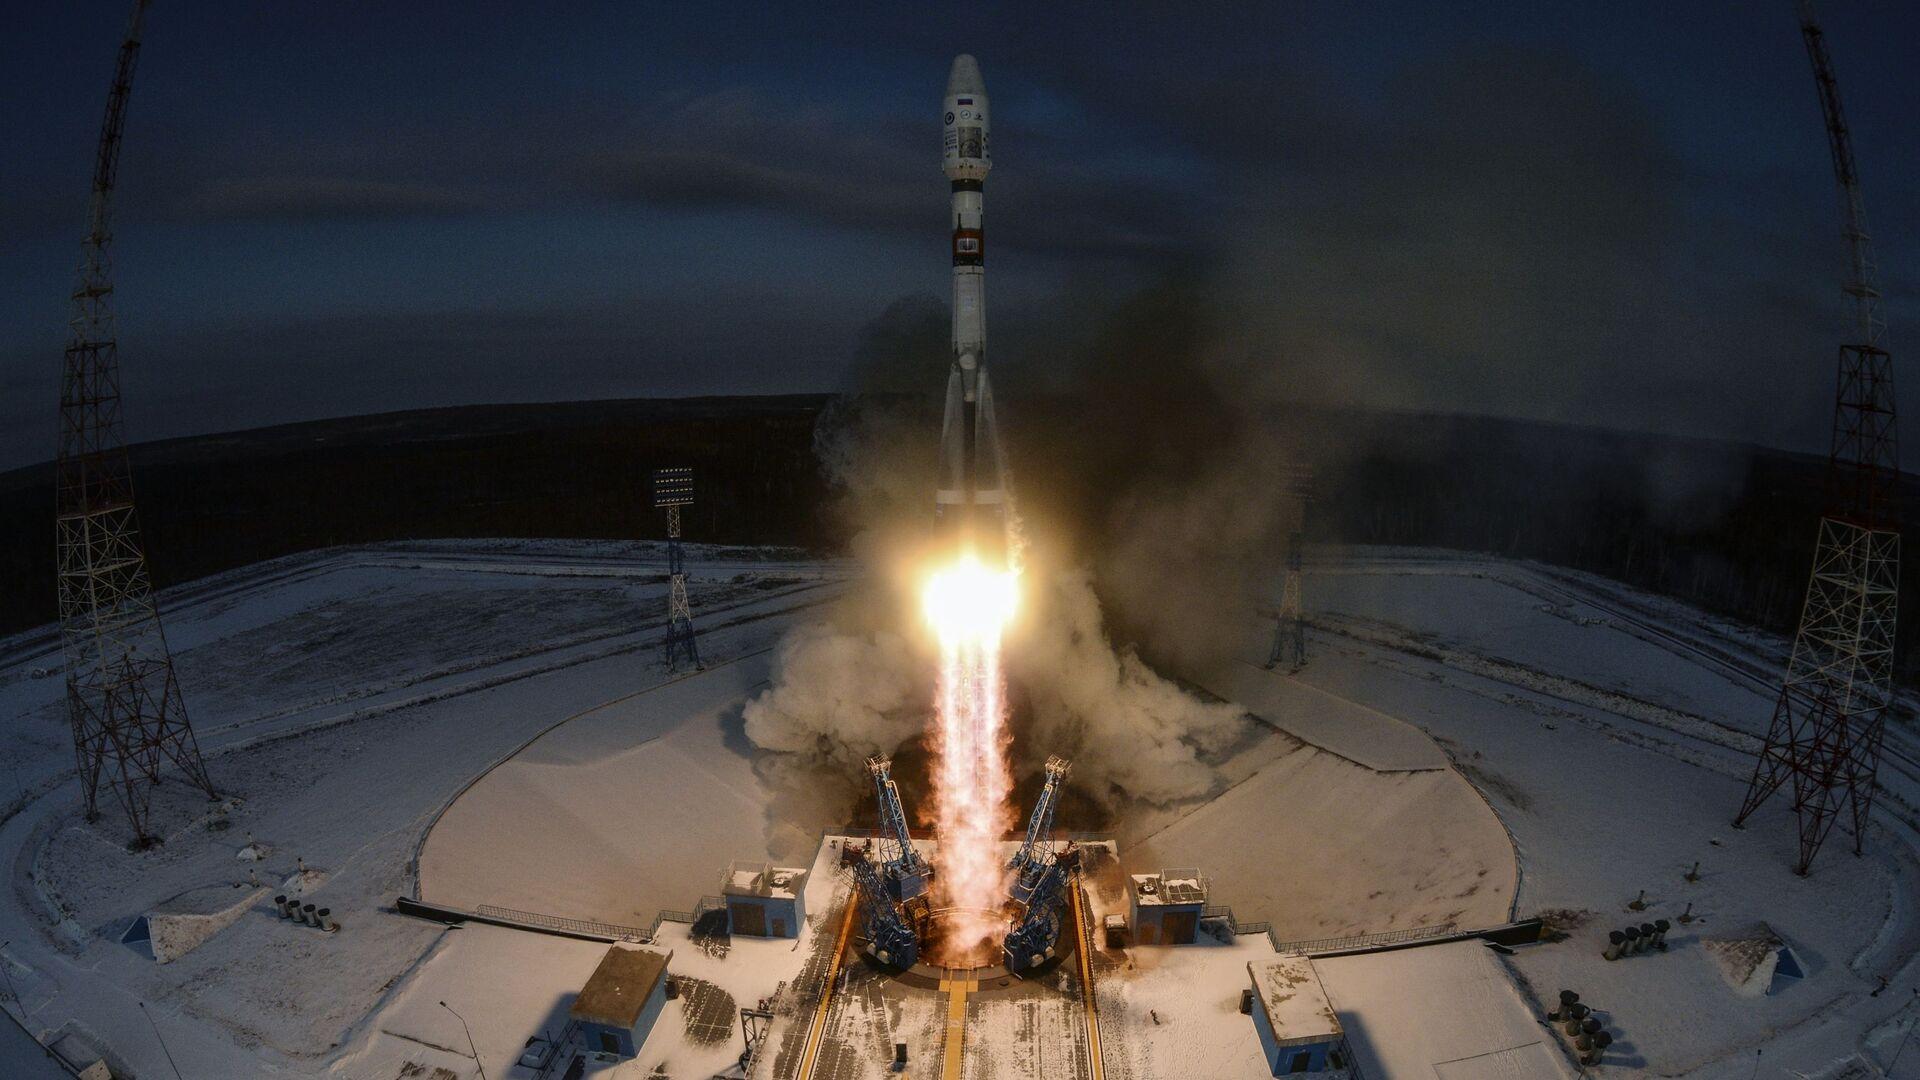 Il lancio del Soyuz-2.1b dal cosmodromo Vostochny - Sputnik Italia, 1920, 29.05.2021